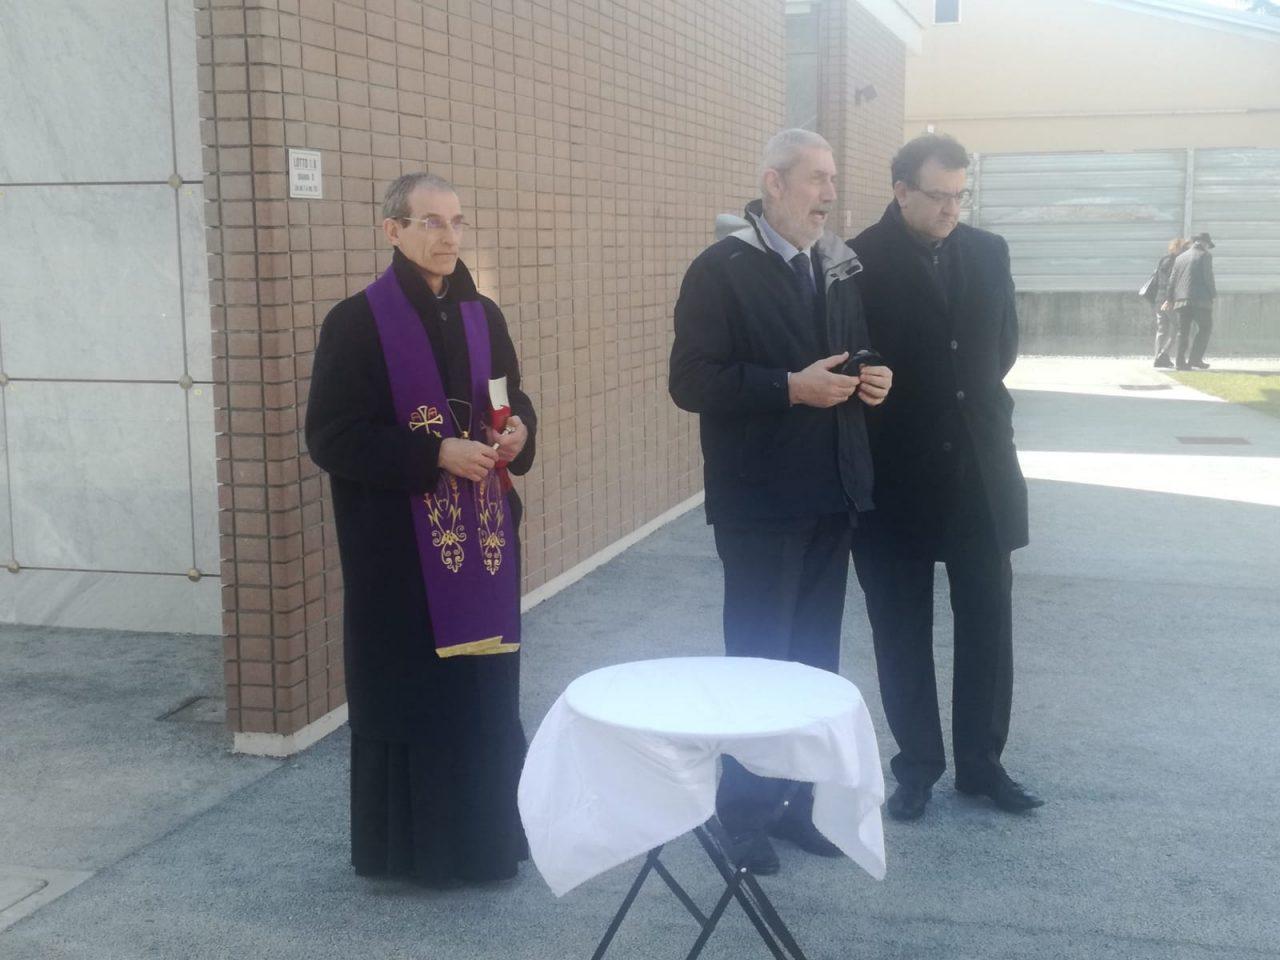 Rho, cerimonia per i nuovi loculi al cimitero